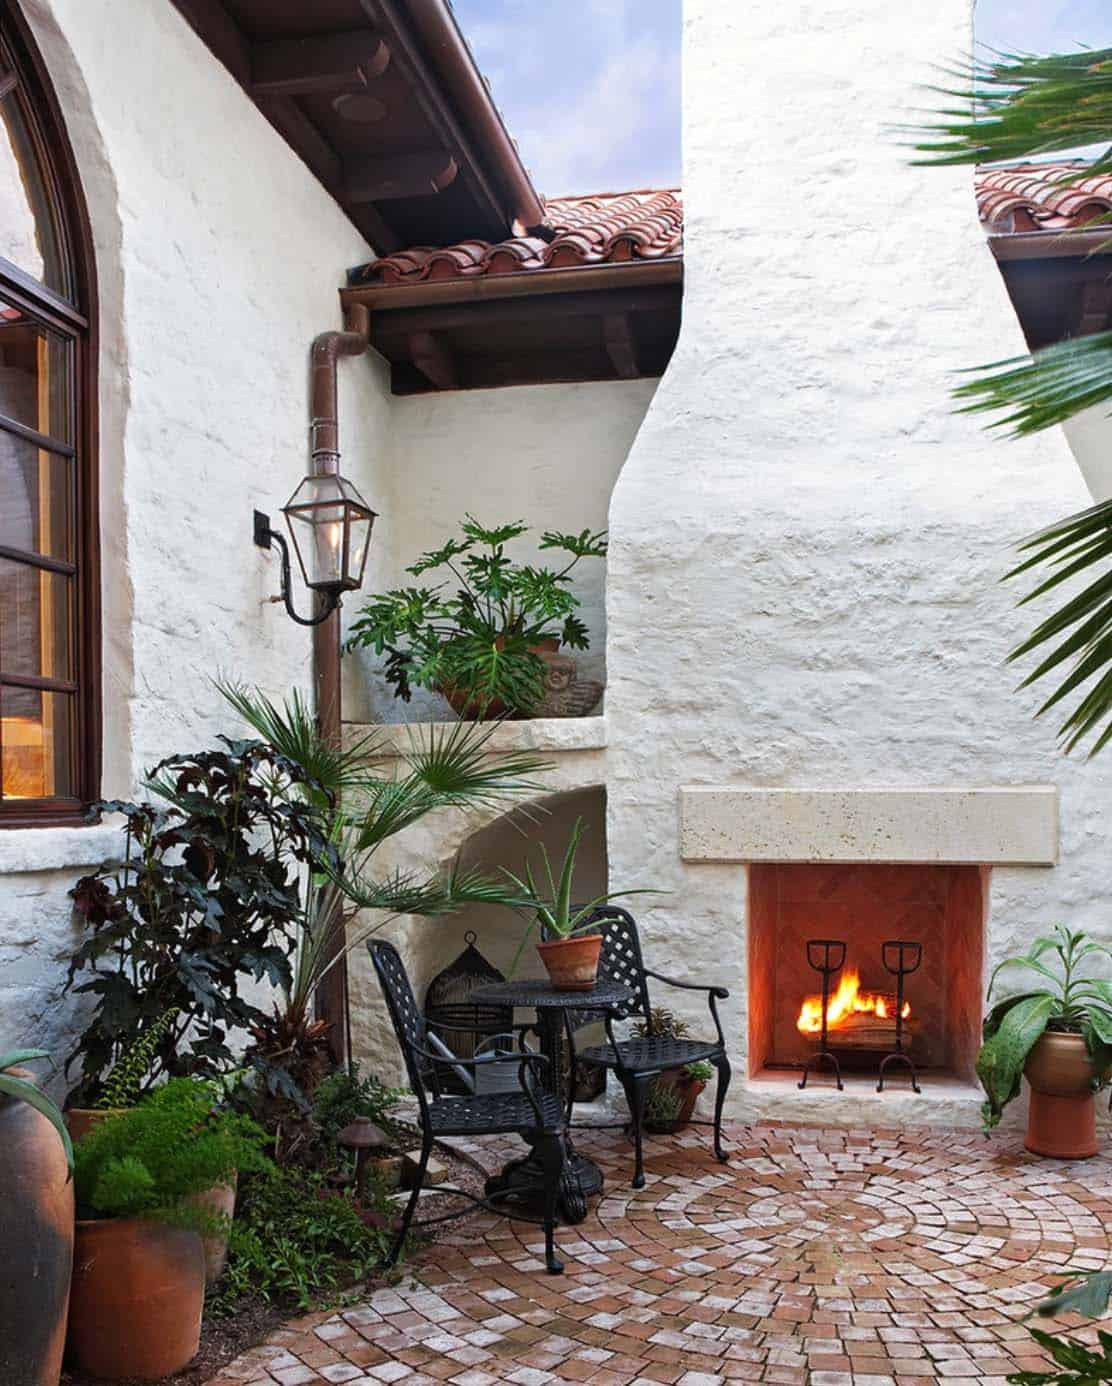 Mediterranean Style Lake House-Cornerstone Architects-10-1 Kindesign